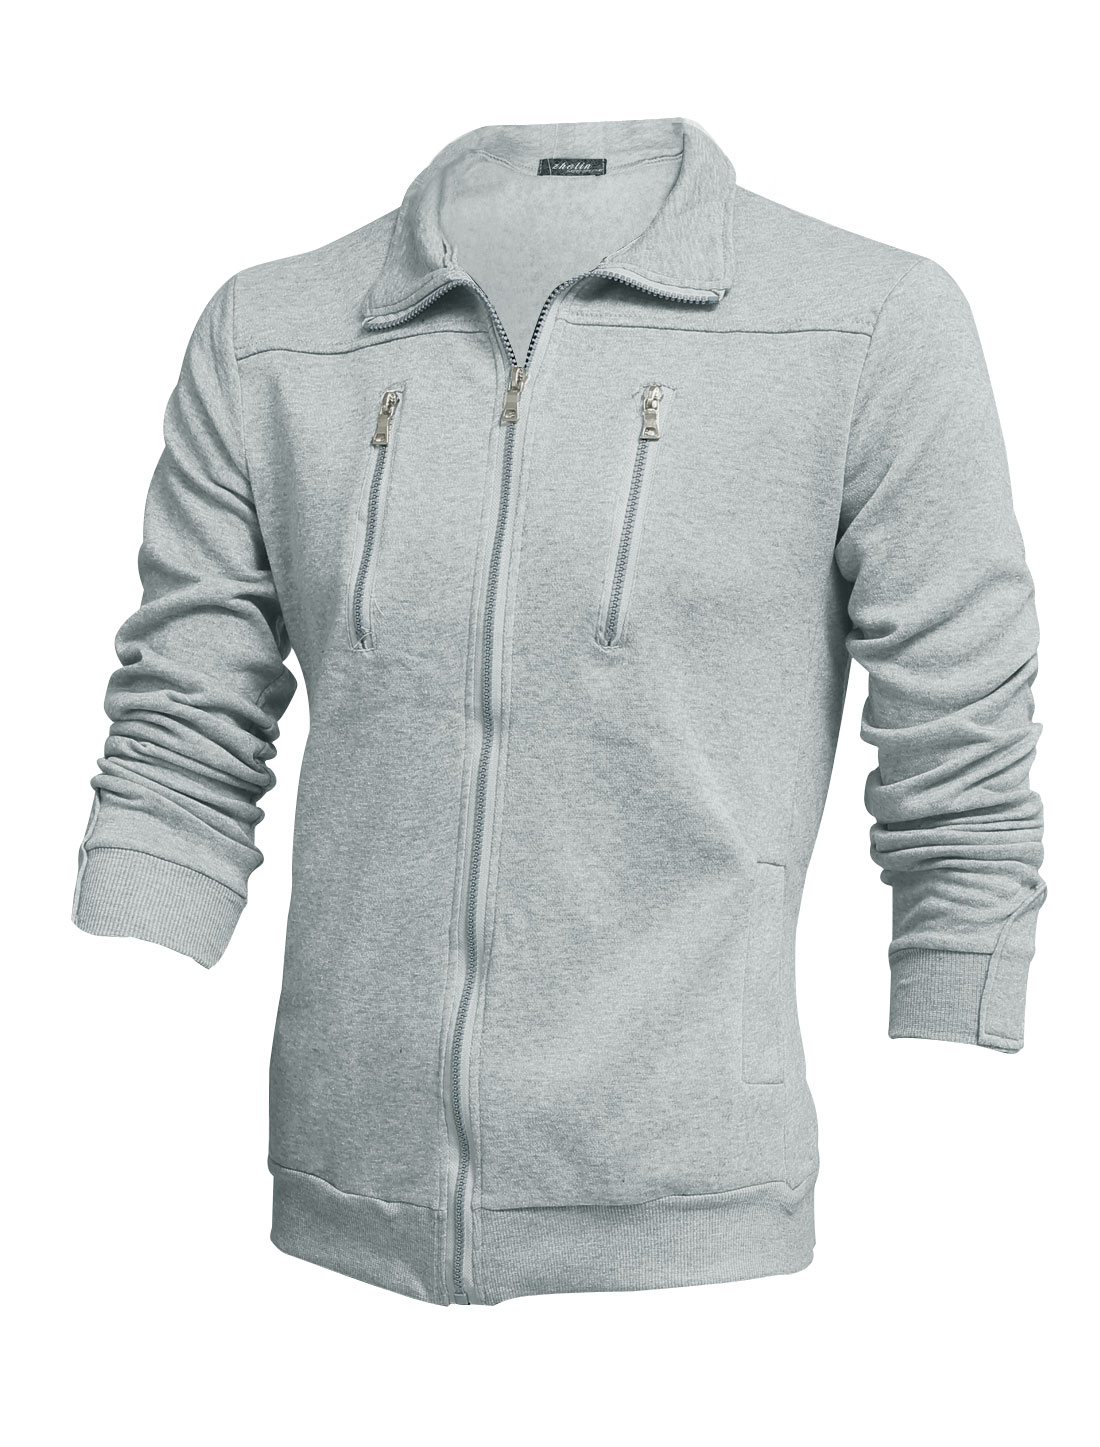 Men Turndown Collar Zipper Decor Long Sleeves Leisure Jacket Light Gray M